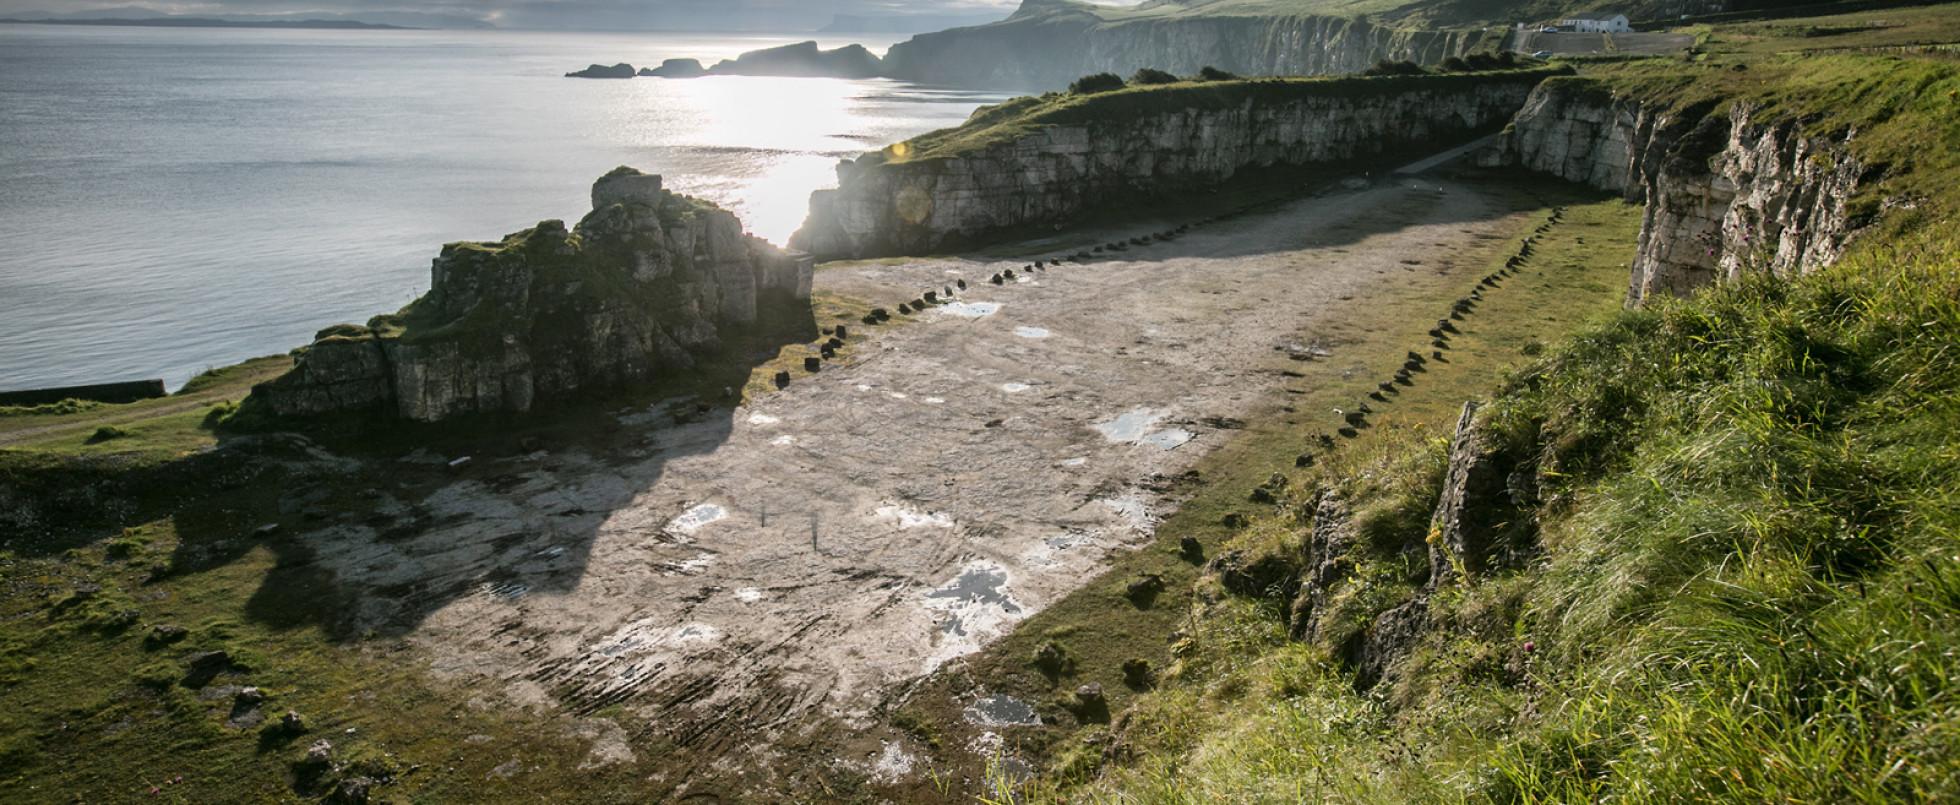 Larrybane: Renly Baratheon's Camp